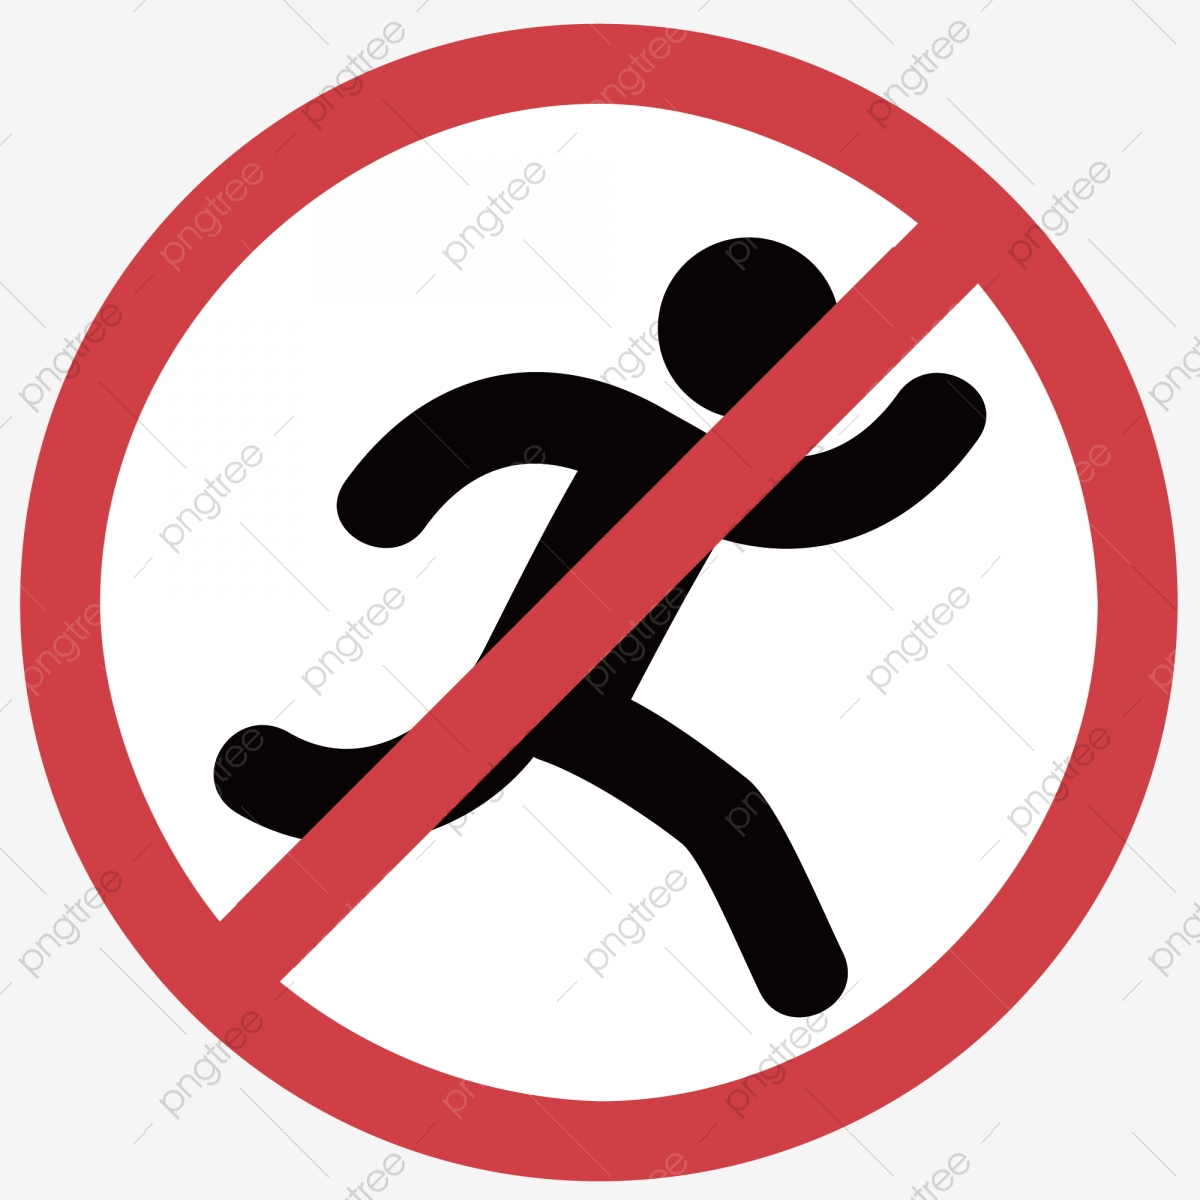 Запрещено бегать картинки